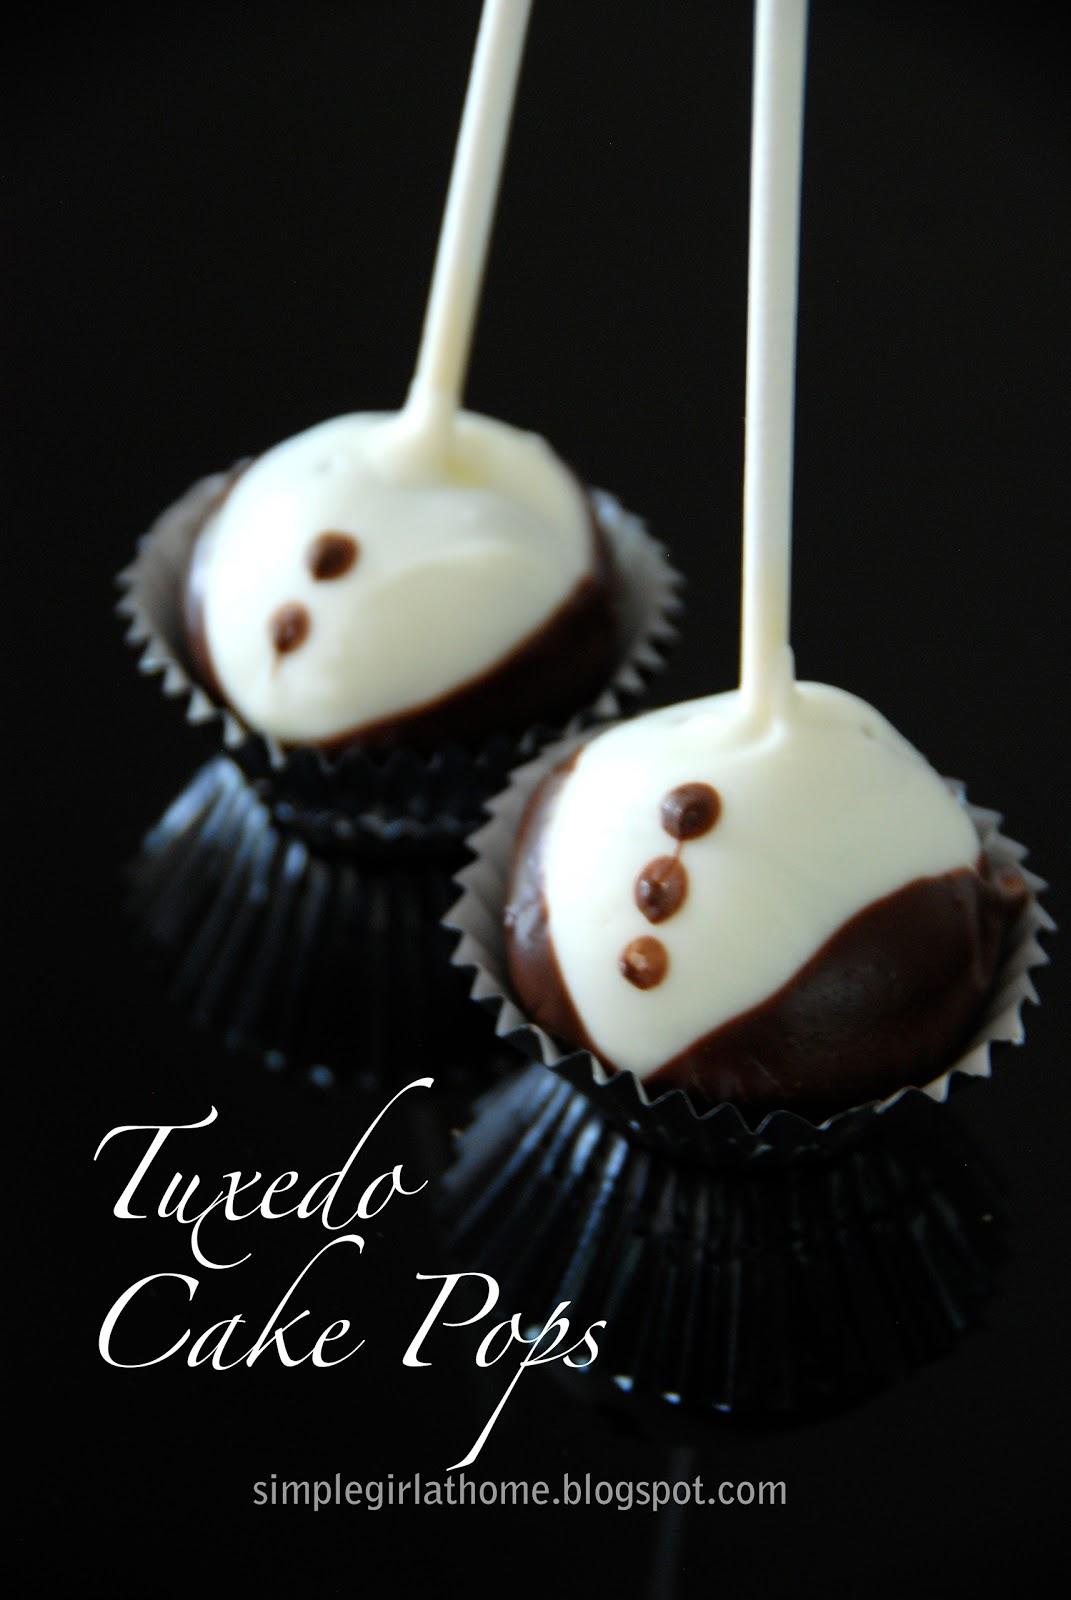 Tuxedo Cake Pops Recipe